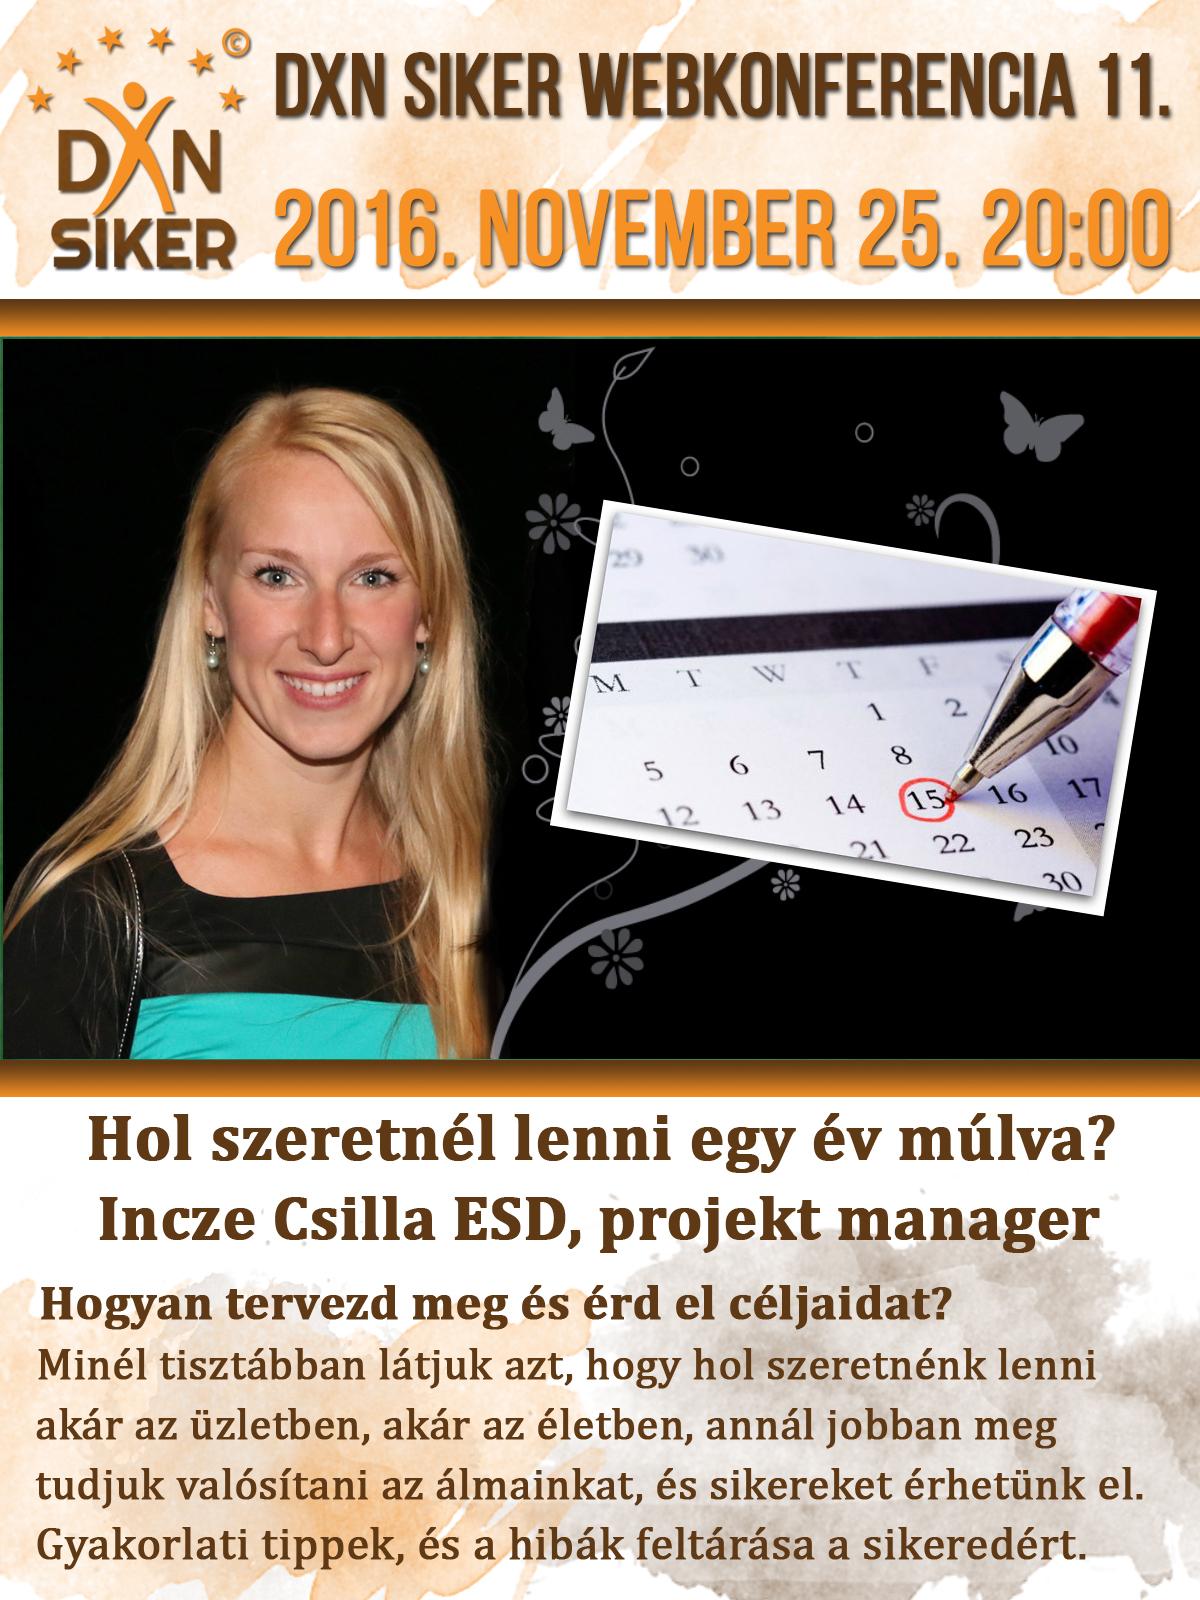 DXN Siker Webkonferencia 11.